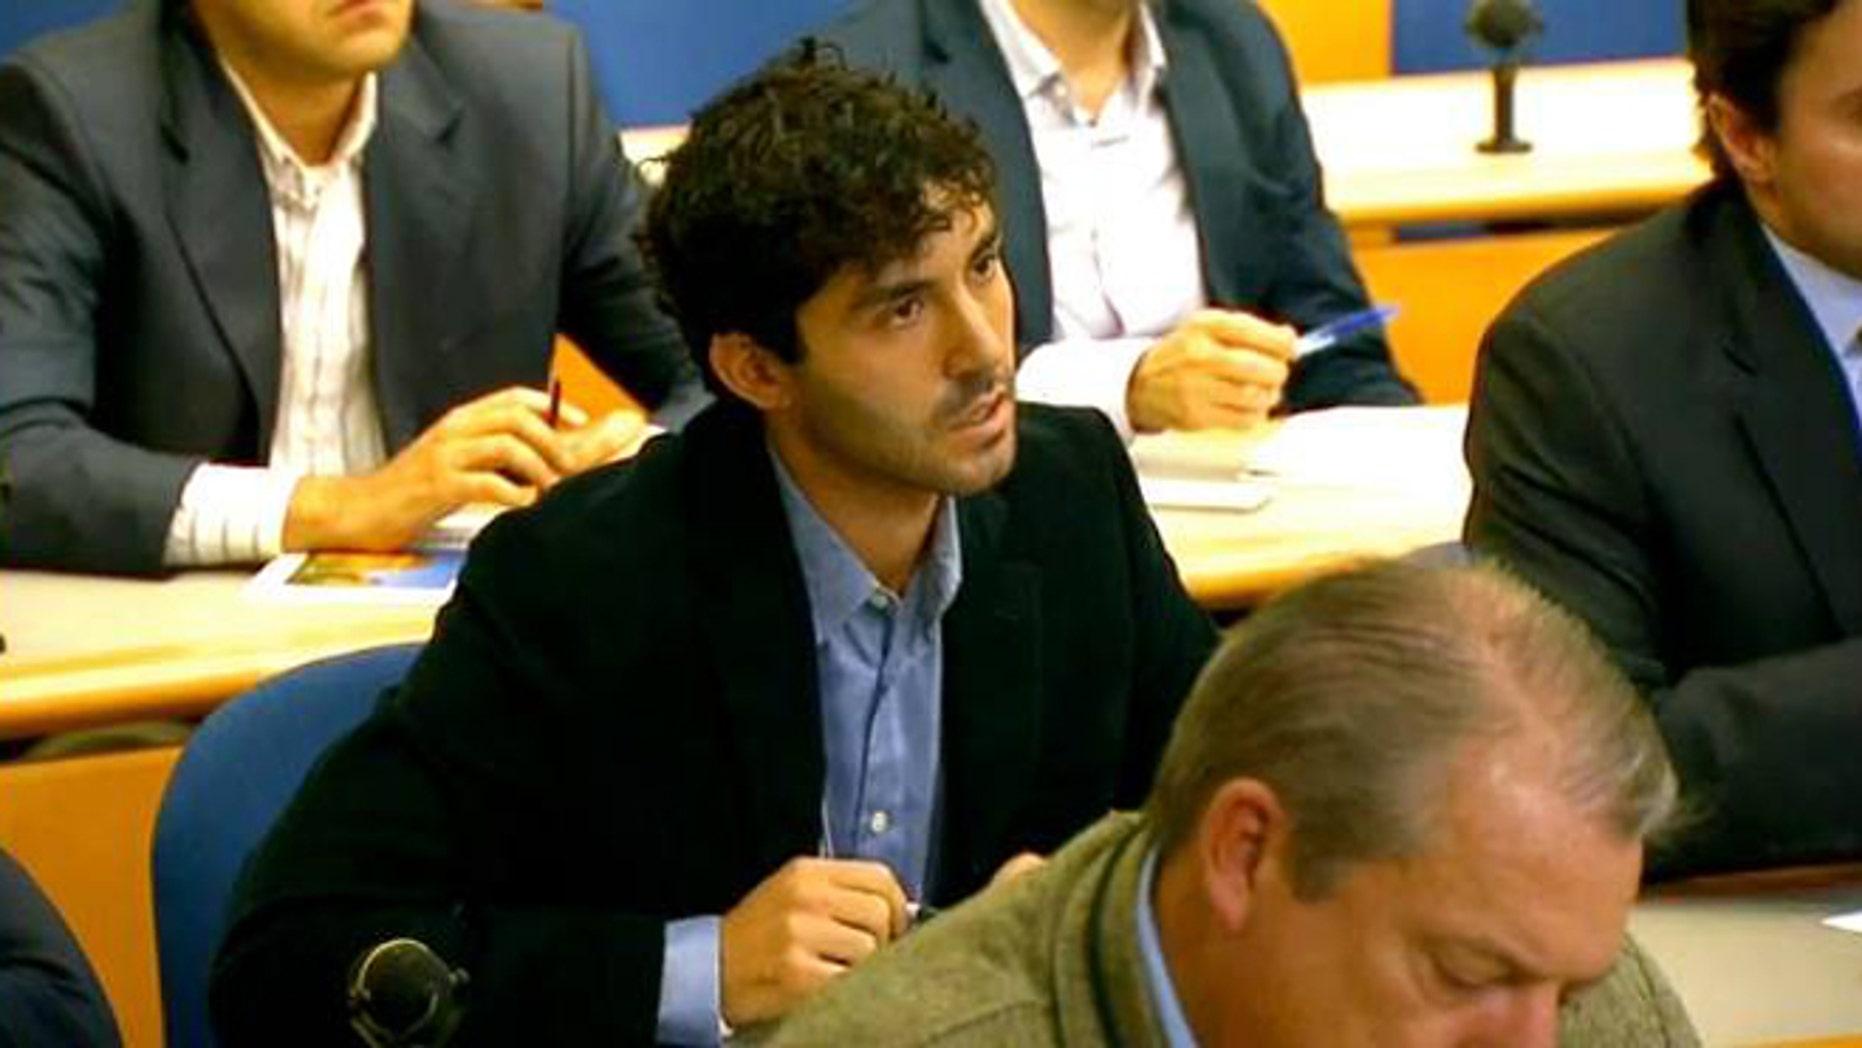 Shown here is Jerusalem Post D.C. bureau chief Michael Wilner.